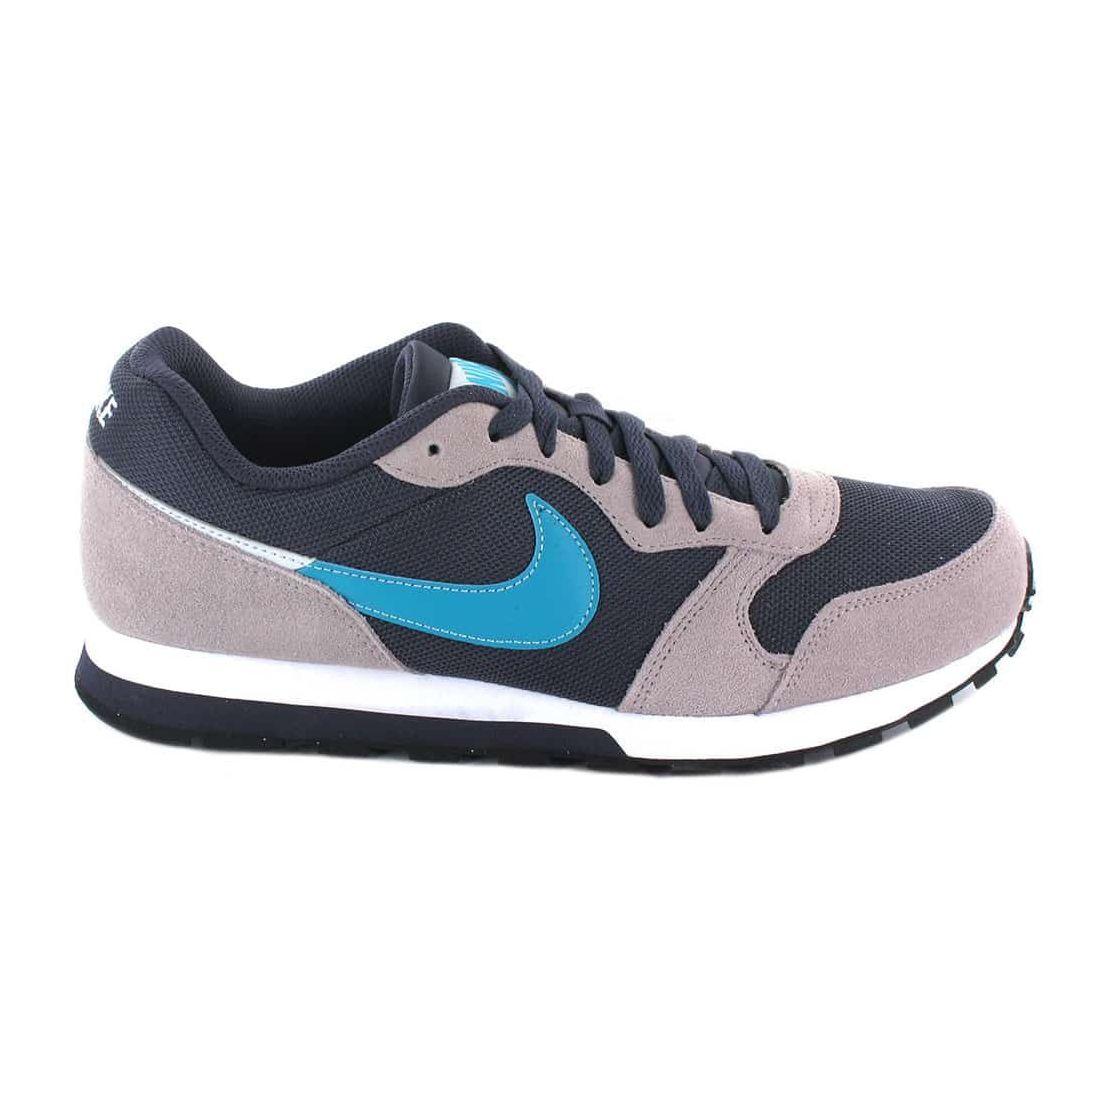 Nike MD Runner 2 002 Nike Chaussures Casual Mens mode de Vie des Tailles: 41, 42, 43, 44, 45; Couleur: gris